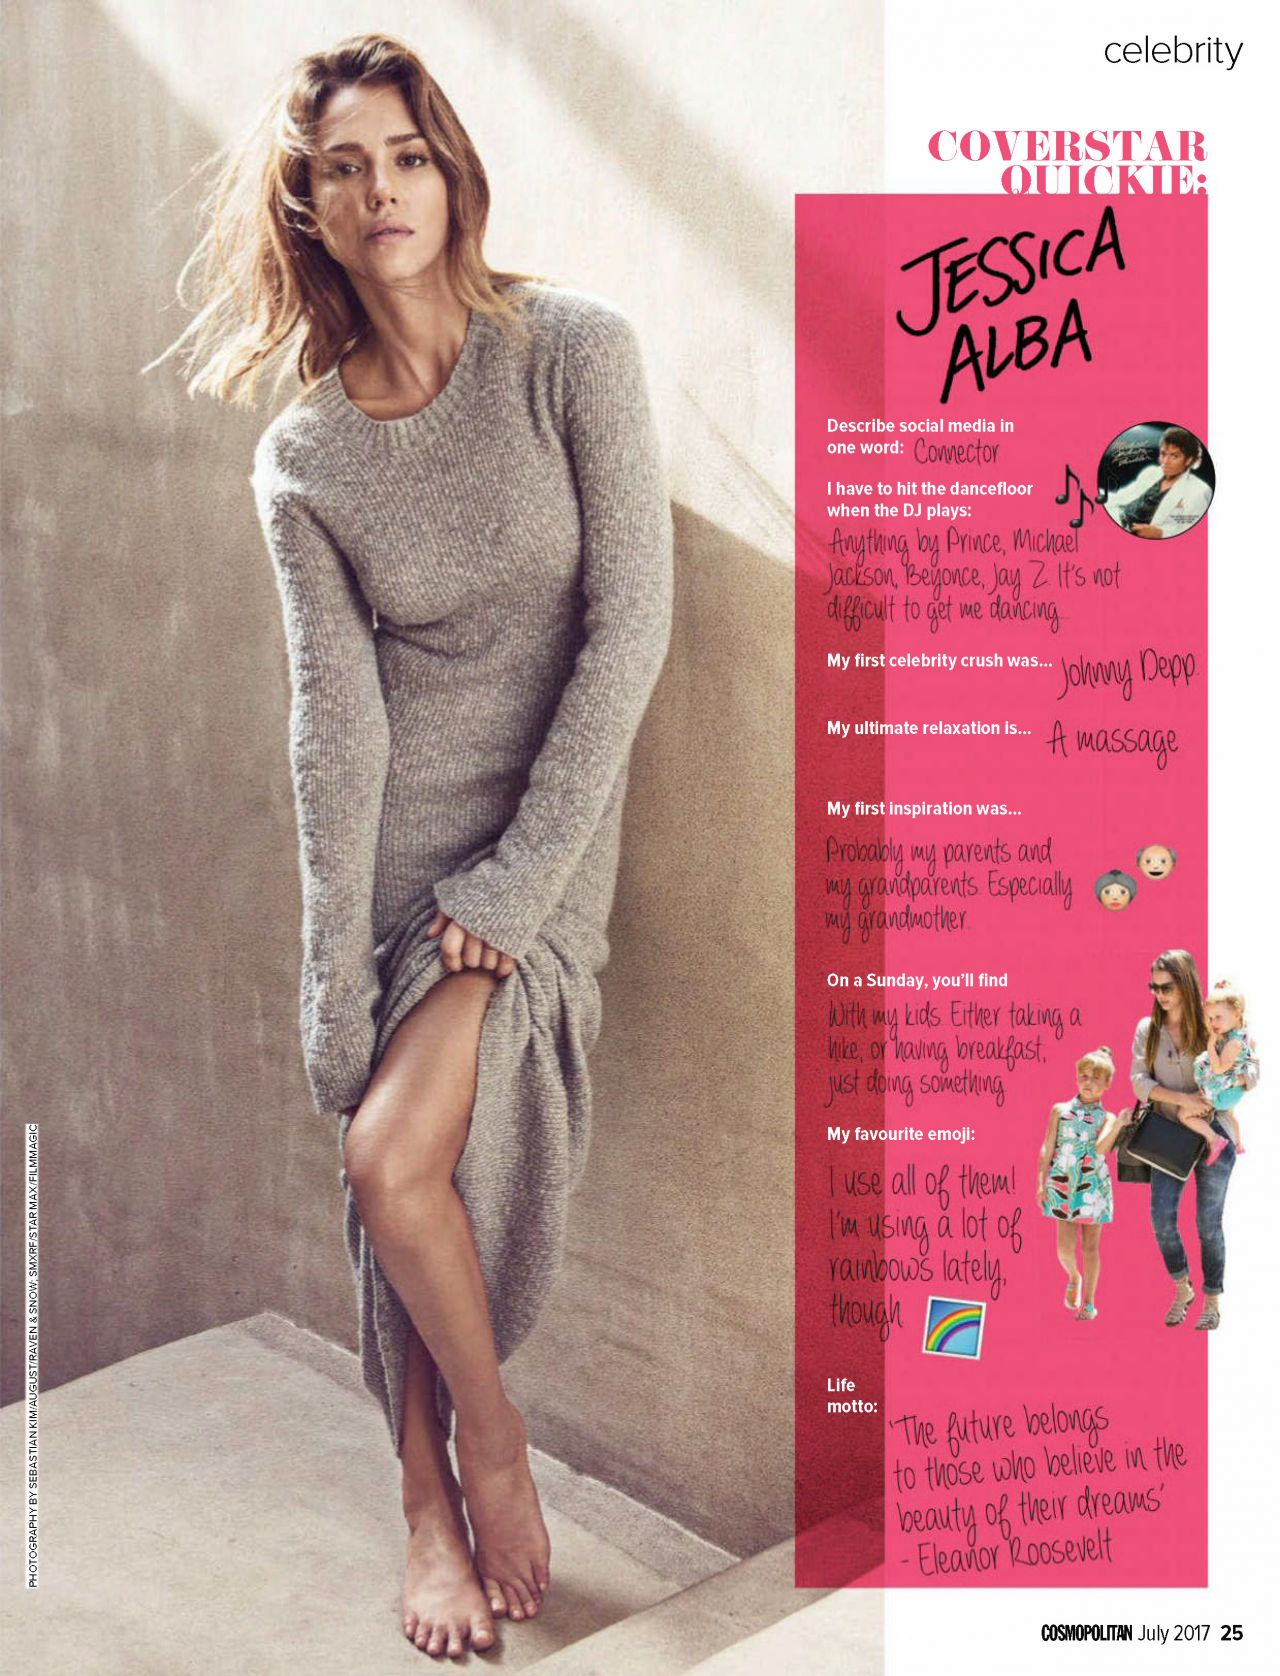 http://celebmafia.com/wp-content/uploads/2017/06/jessica-alba-cosmopolitan-australia-july-2017-issue-8.jpg